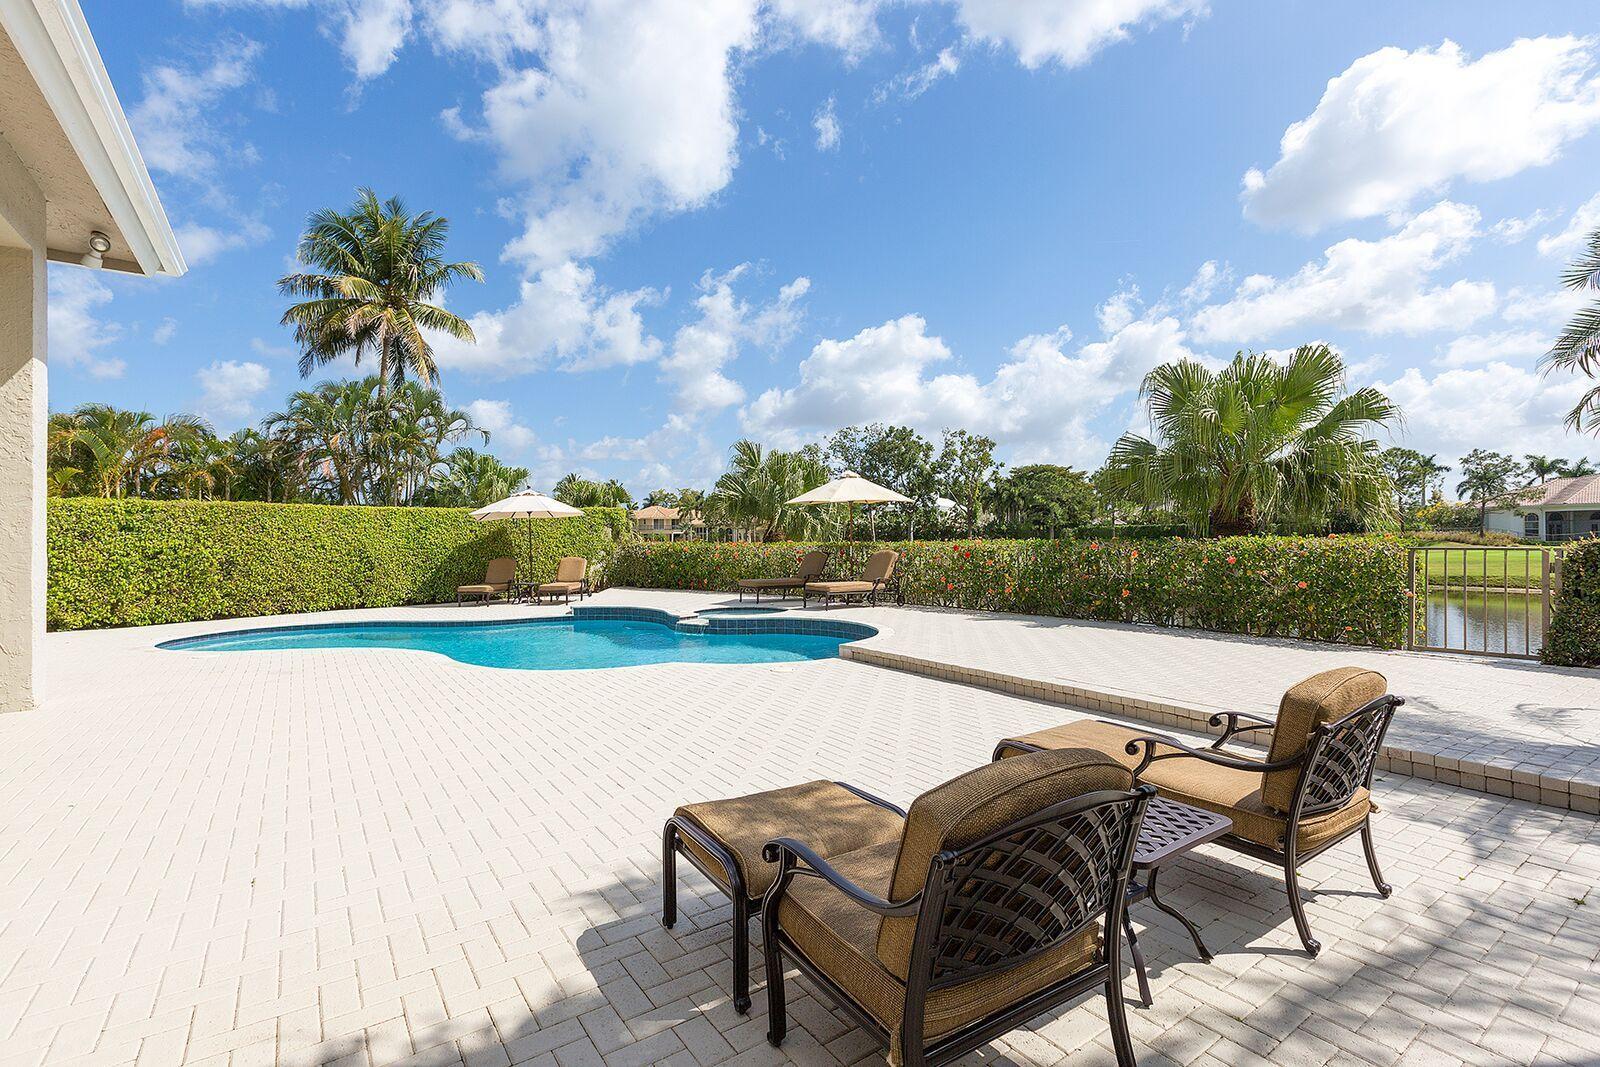 2980 Twin Oaks Way, Wellington, Florida 33414, 3 Bedrooms Bedrooms, ,2.1 BathroomsBathrooms,Villa,For Rent,Shady Oaks,Twin Oaks Way,RX-10526909